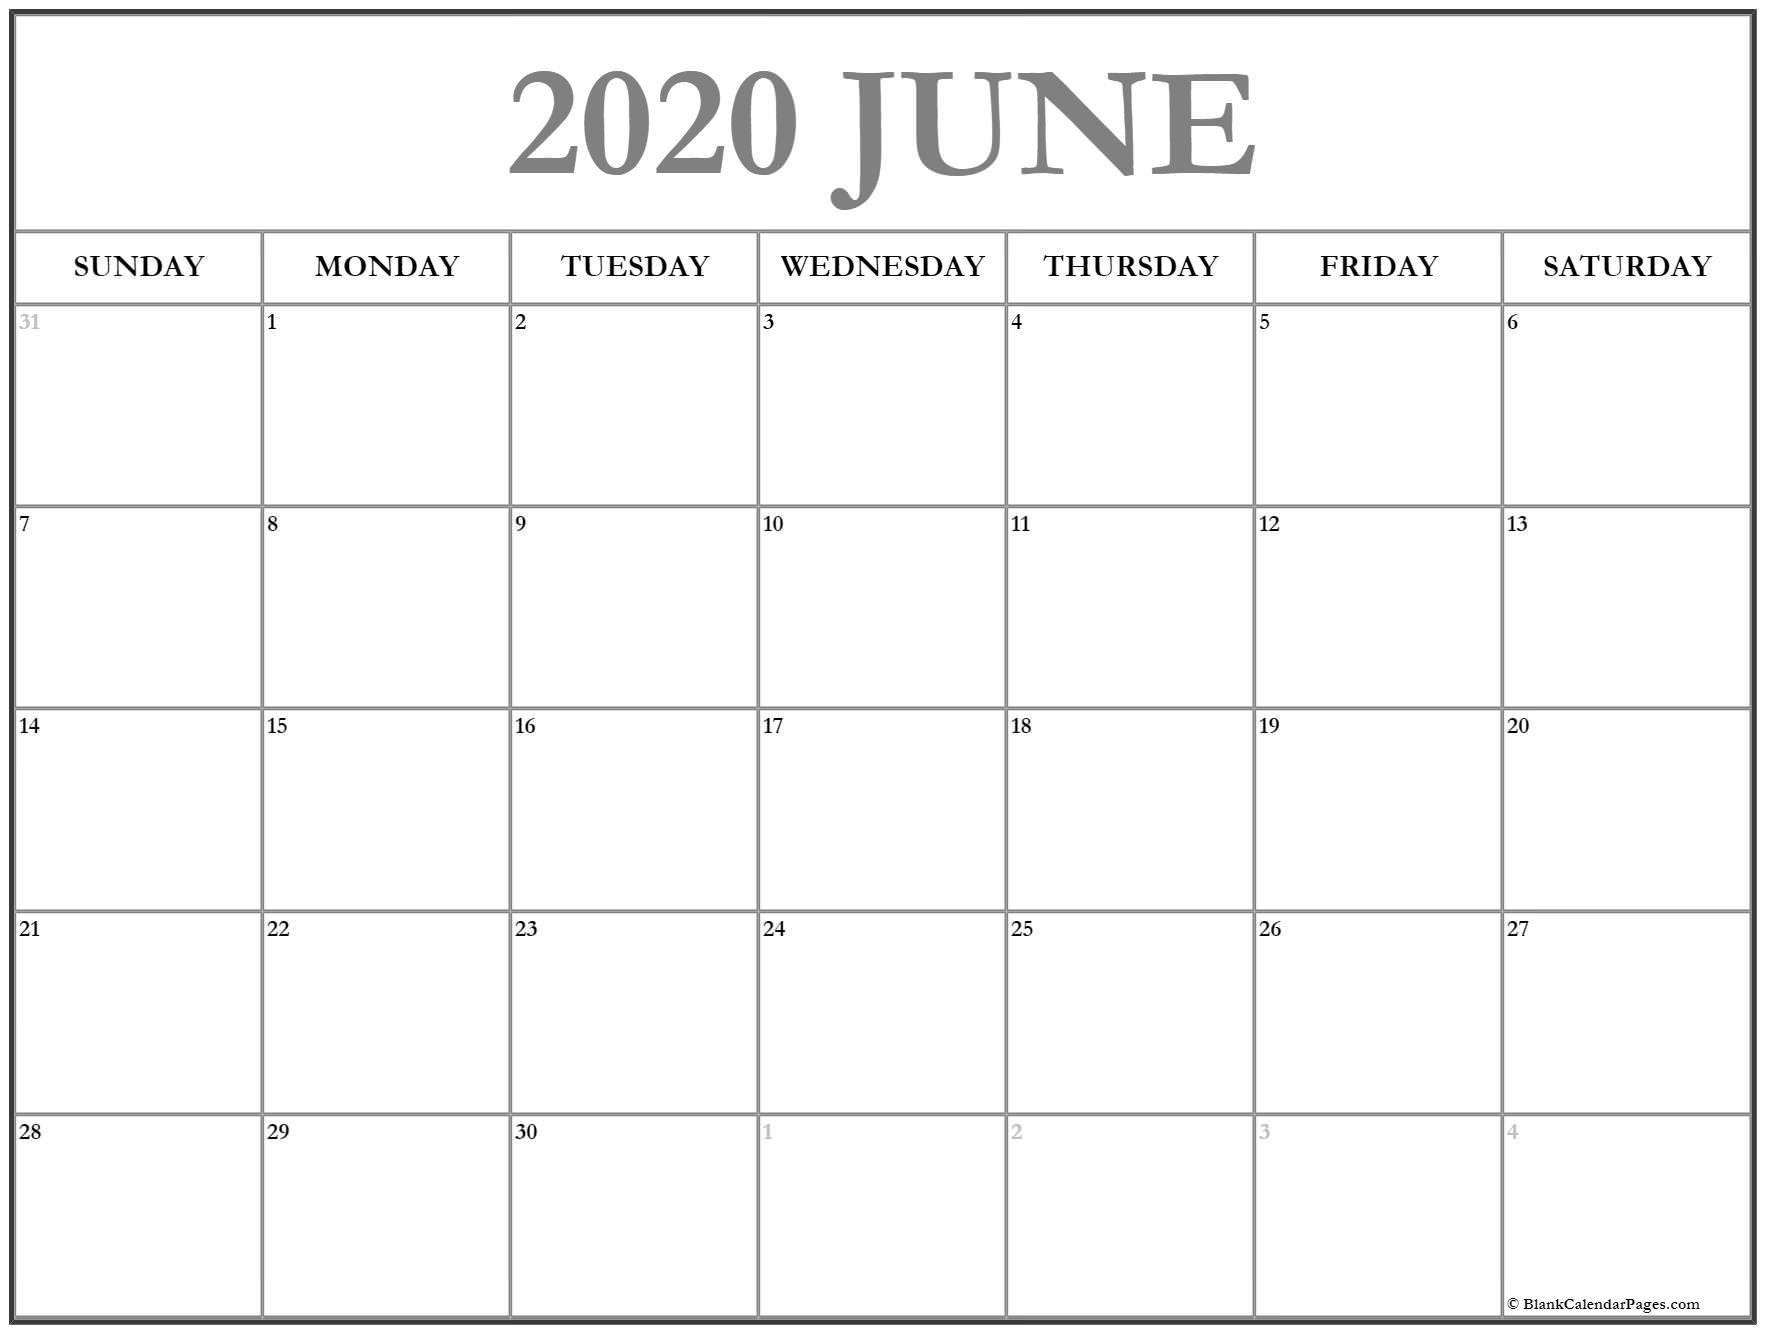 Blank 2020 Printable Calendar June 2020 Calendar